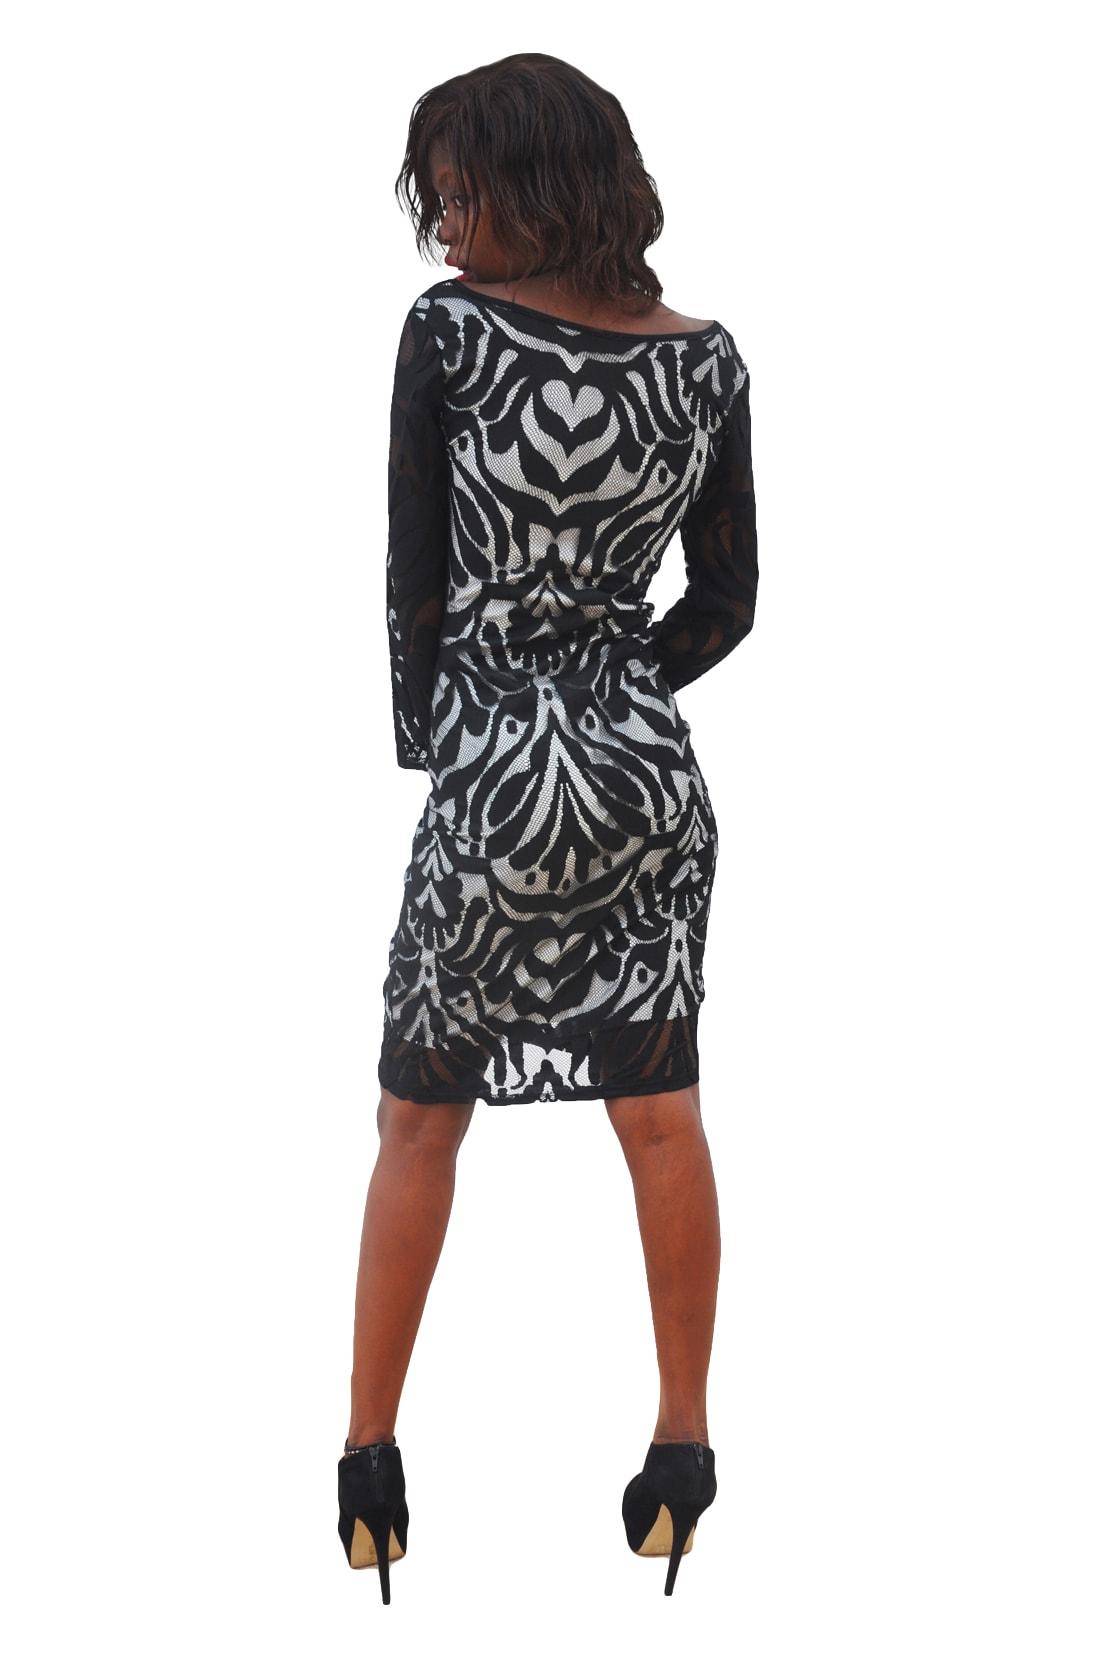 M0287 blackwhite3 Party Dresses maureens.com boutique